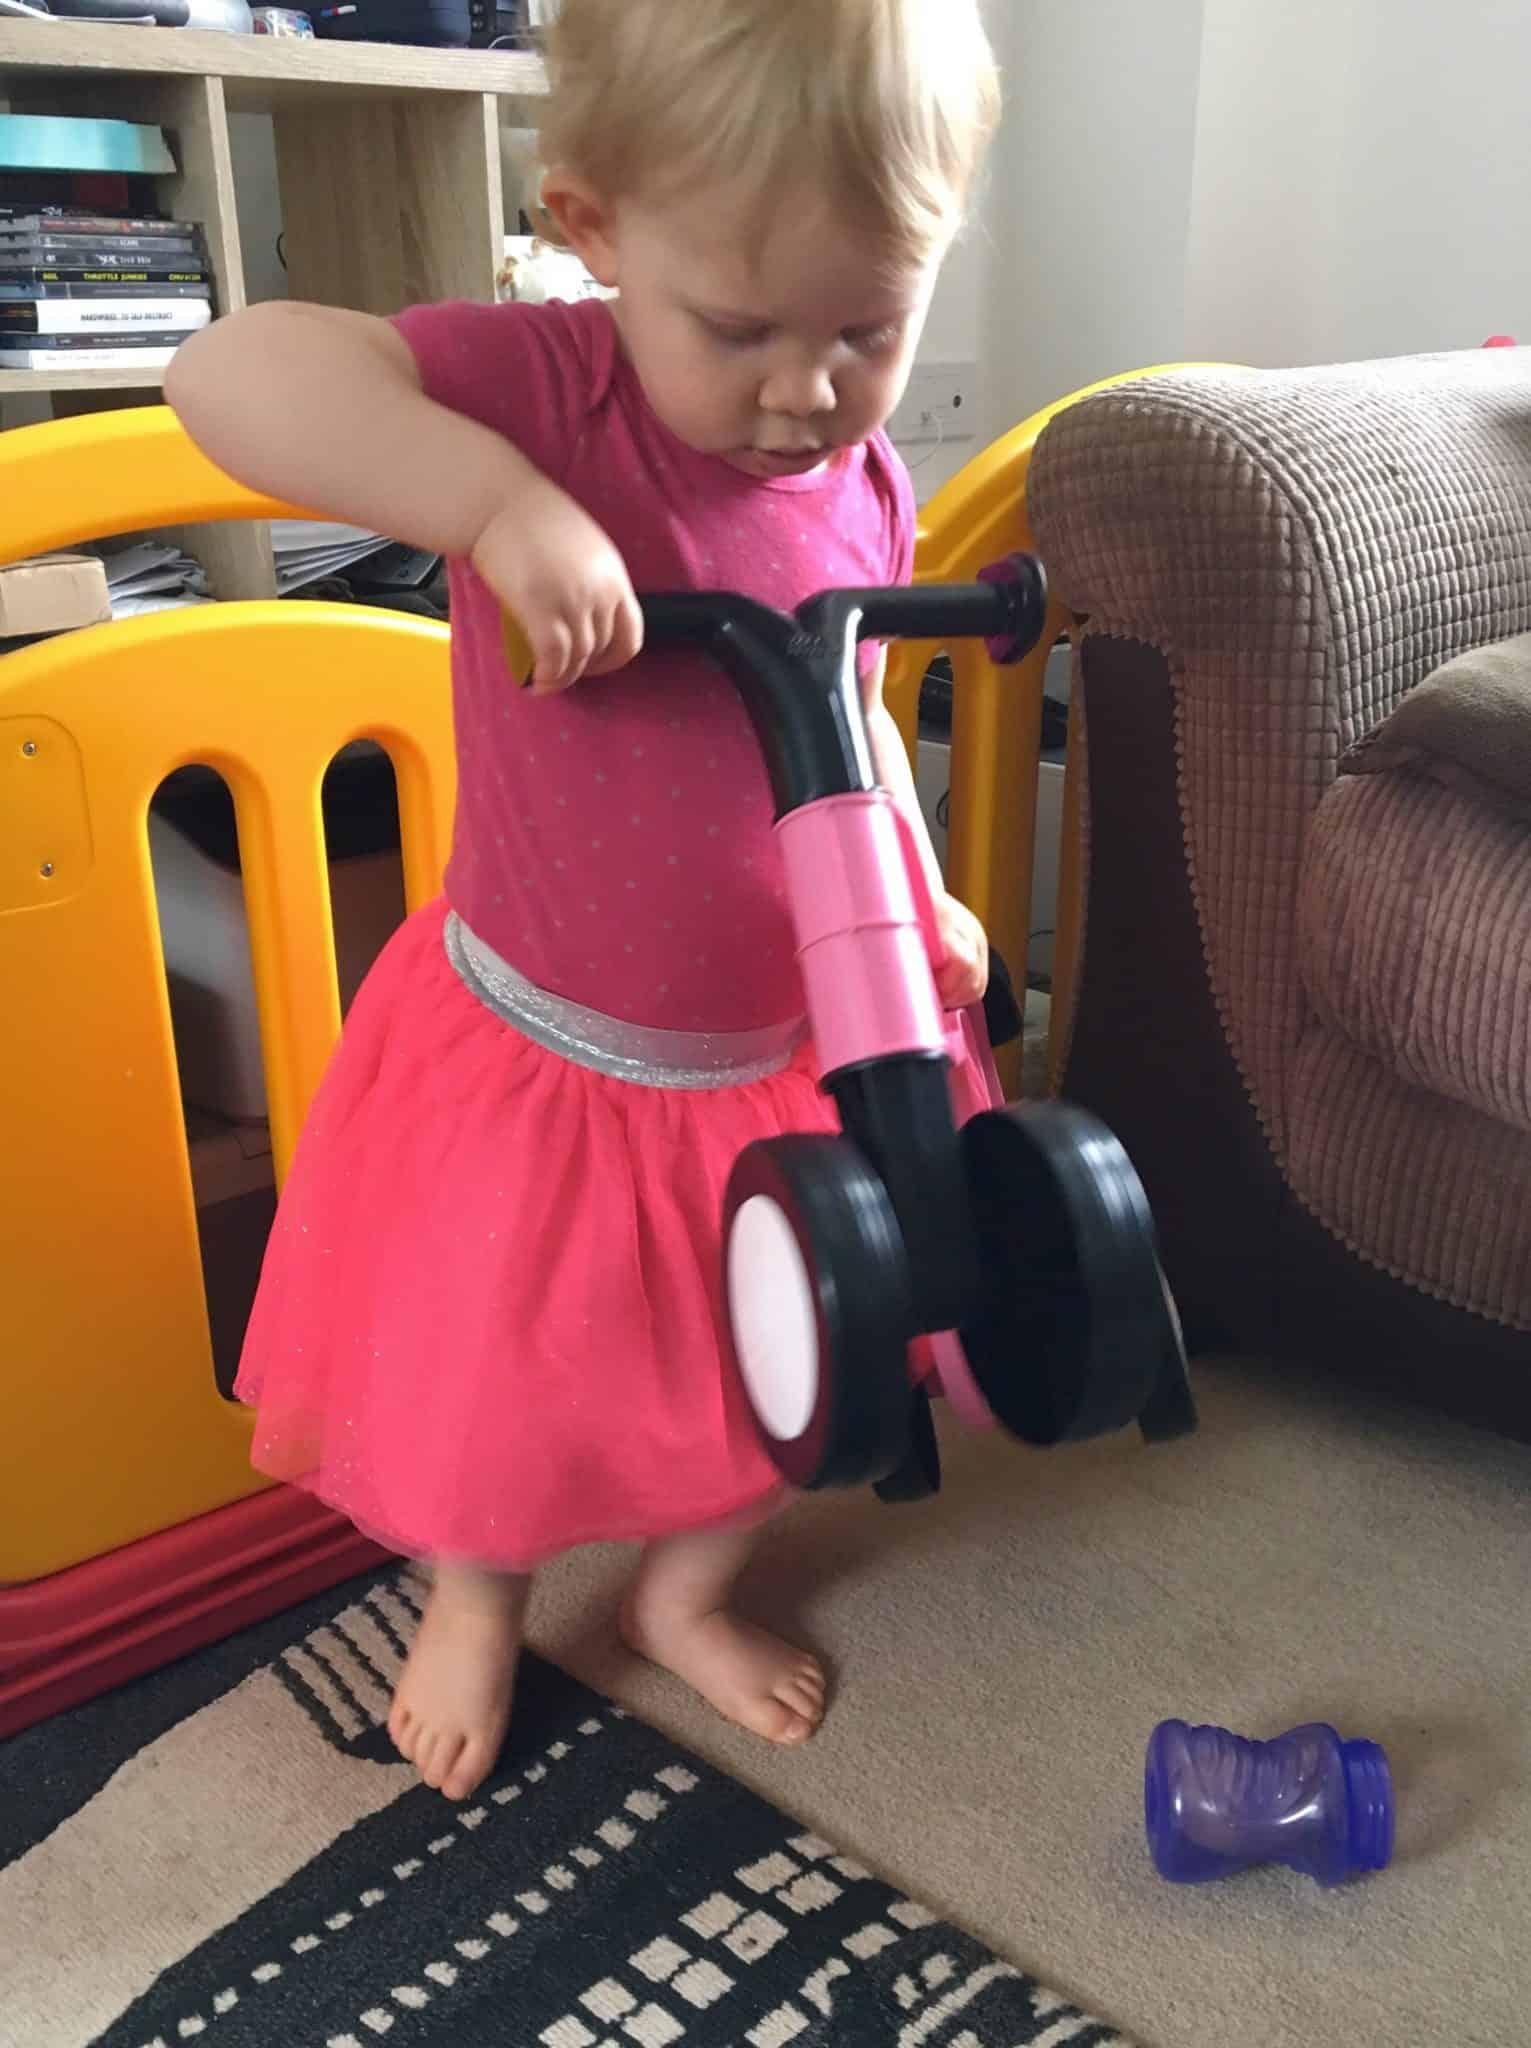 Baby girl inspecting her Toddlebike 2